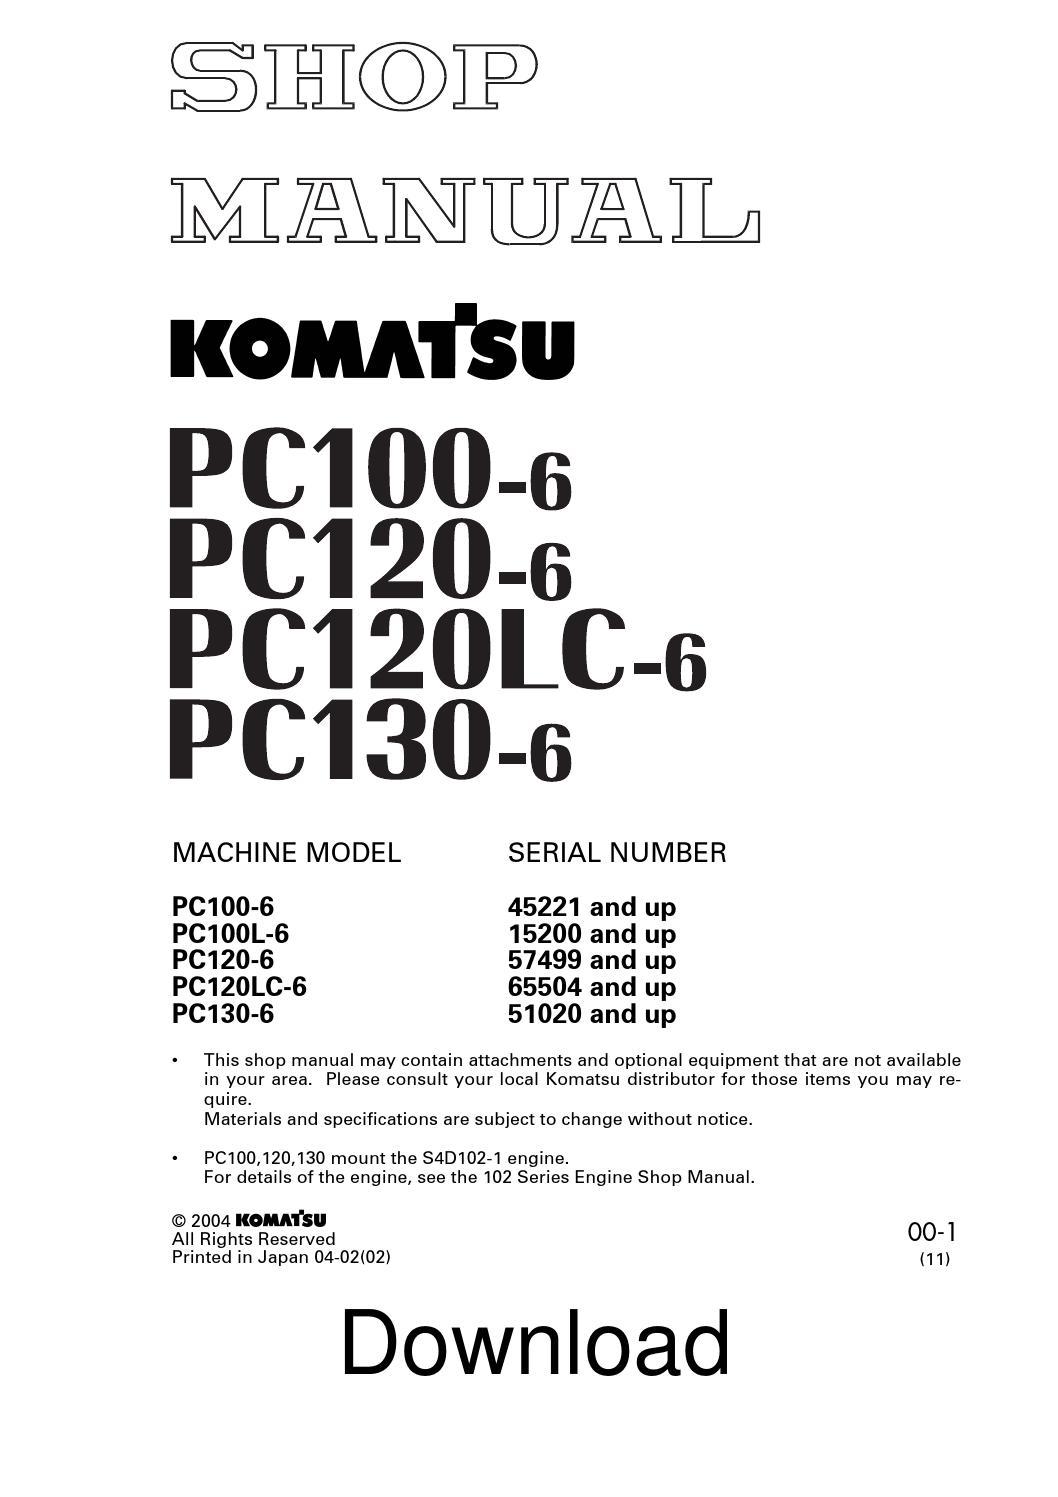 KOMATSU PC100-6, PC120-6, PC120LC-6, PC130-6 HYDRAULIC EXCAVATOR WORKSHOP  REPAIR MANUAL SEBM010611 by Li Yunlong - issuu